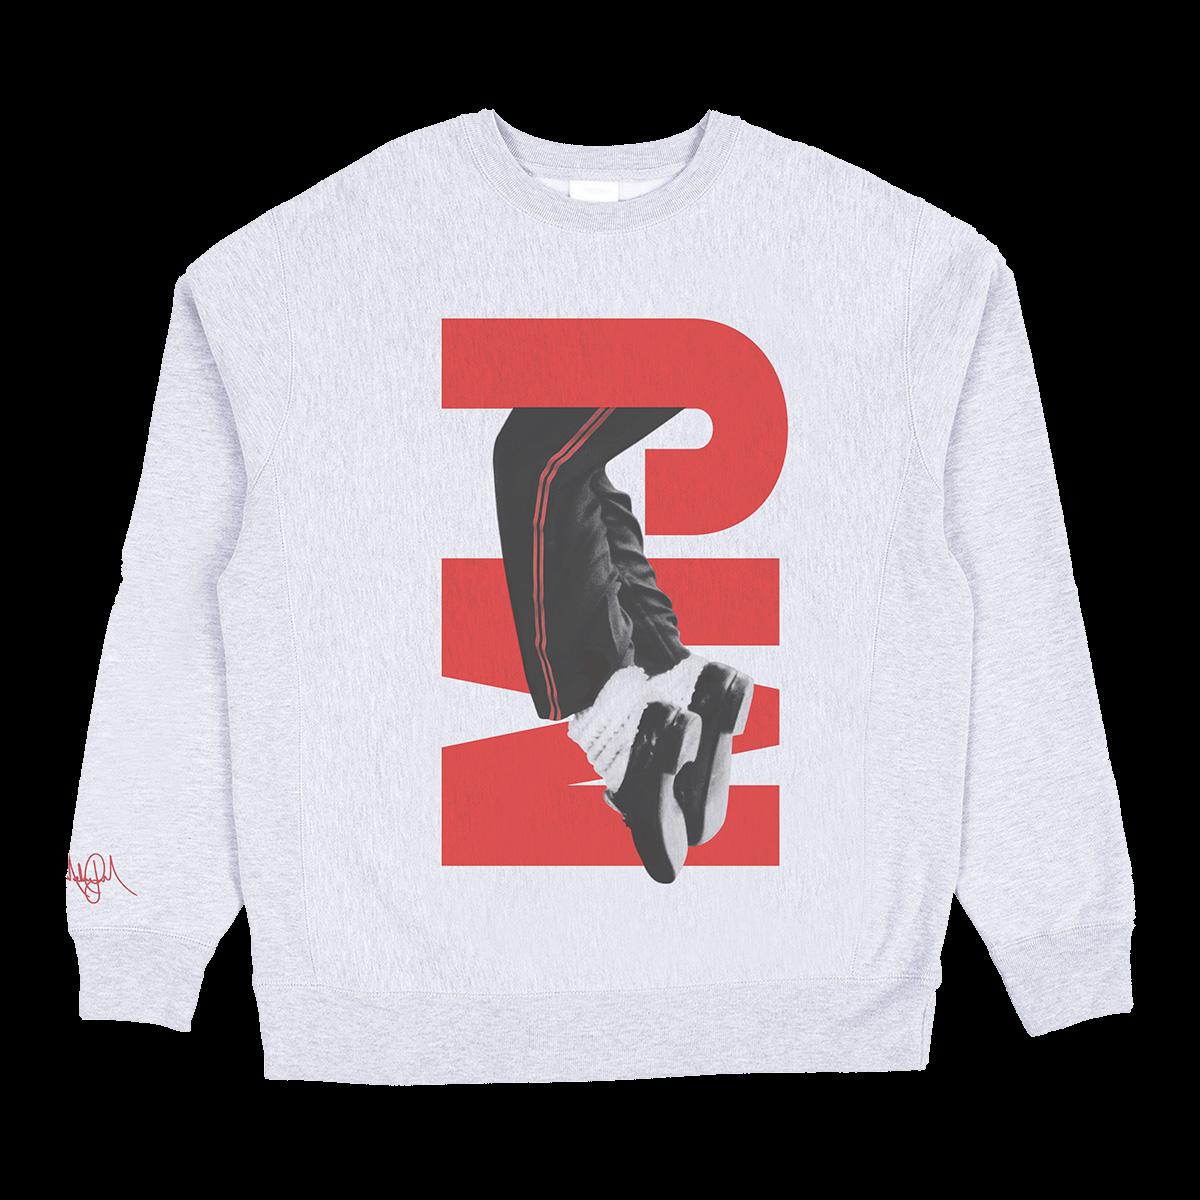 Dancing Shoes Crewneck Sweatshirt